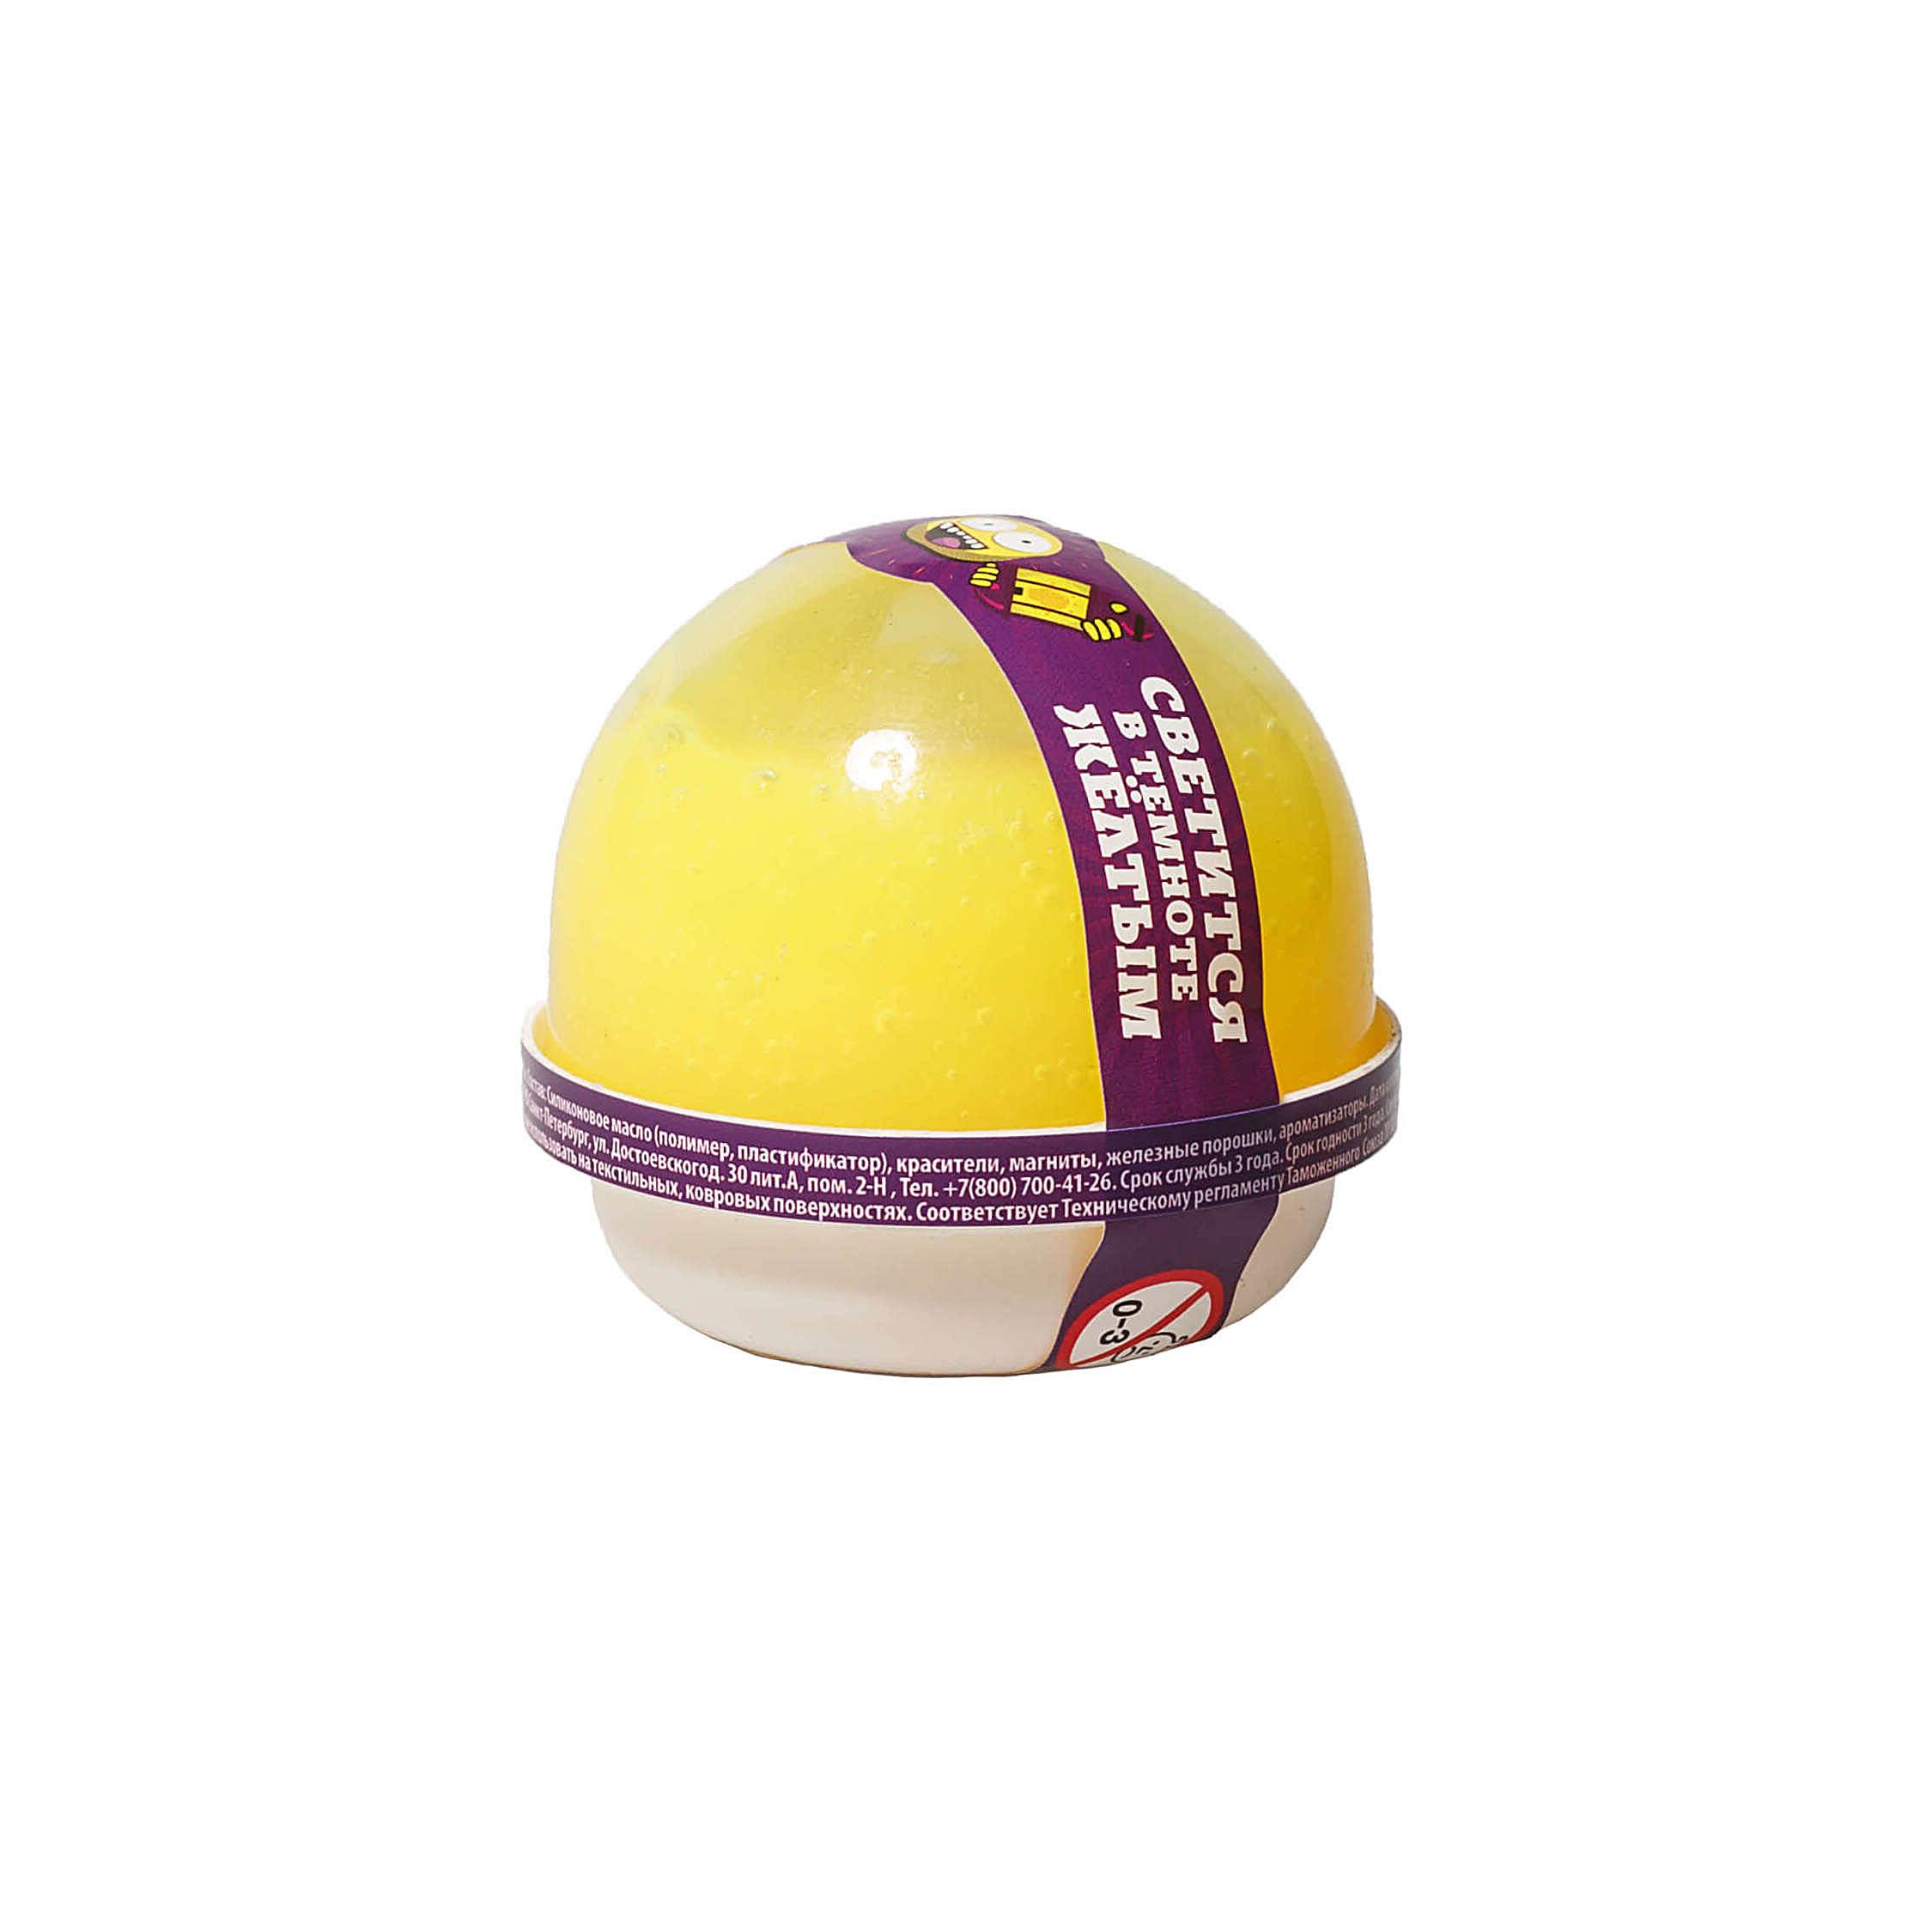 "NGYG25 ""Жвачка для рук ""Nano gum"", светится желтым"", 25 гр."